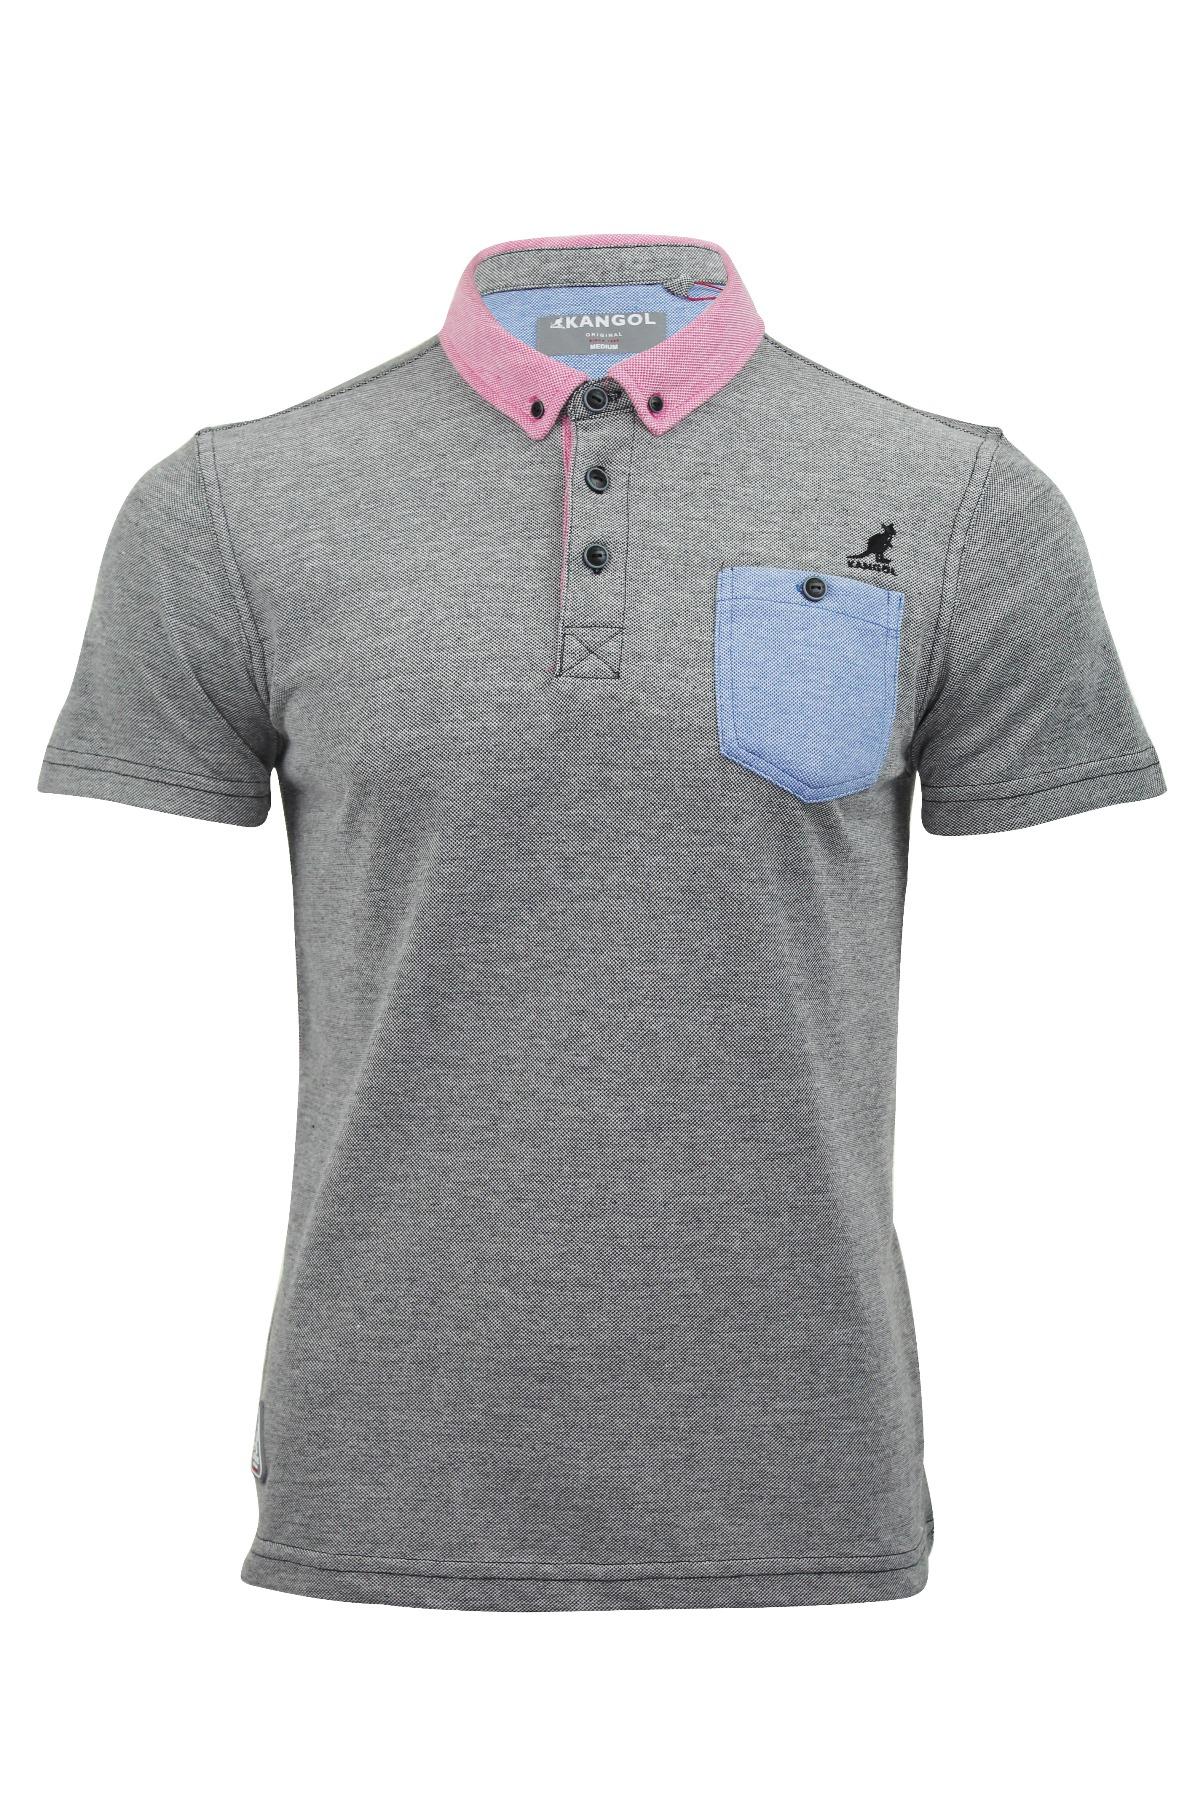 Mens Pique Polo Shirt 'Joyner' T Shirts Button Down Collar | eBay